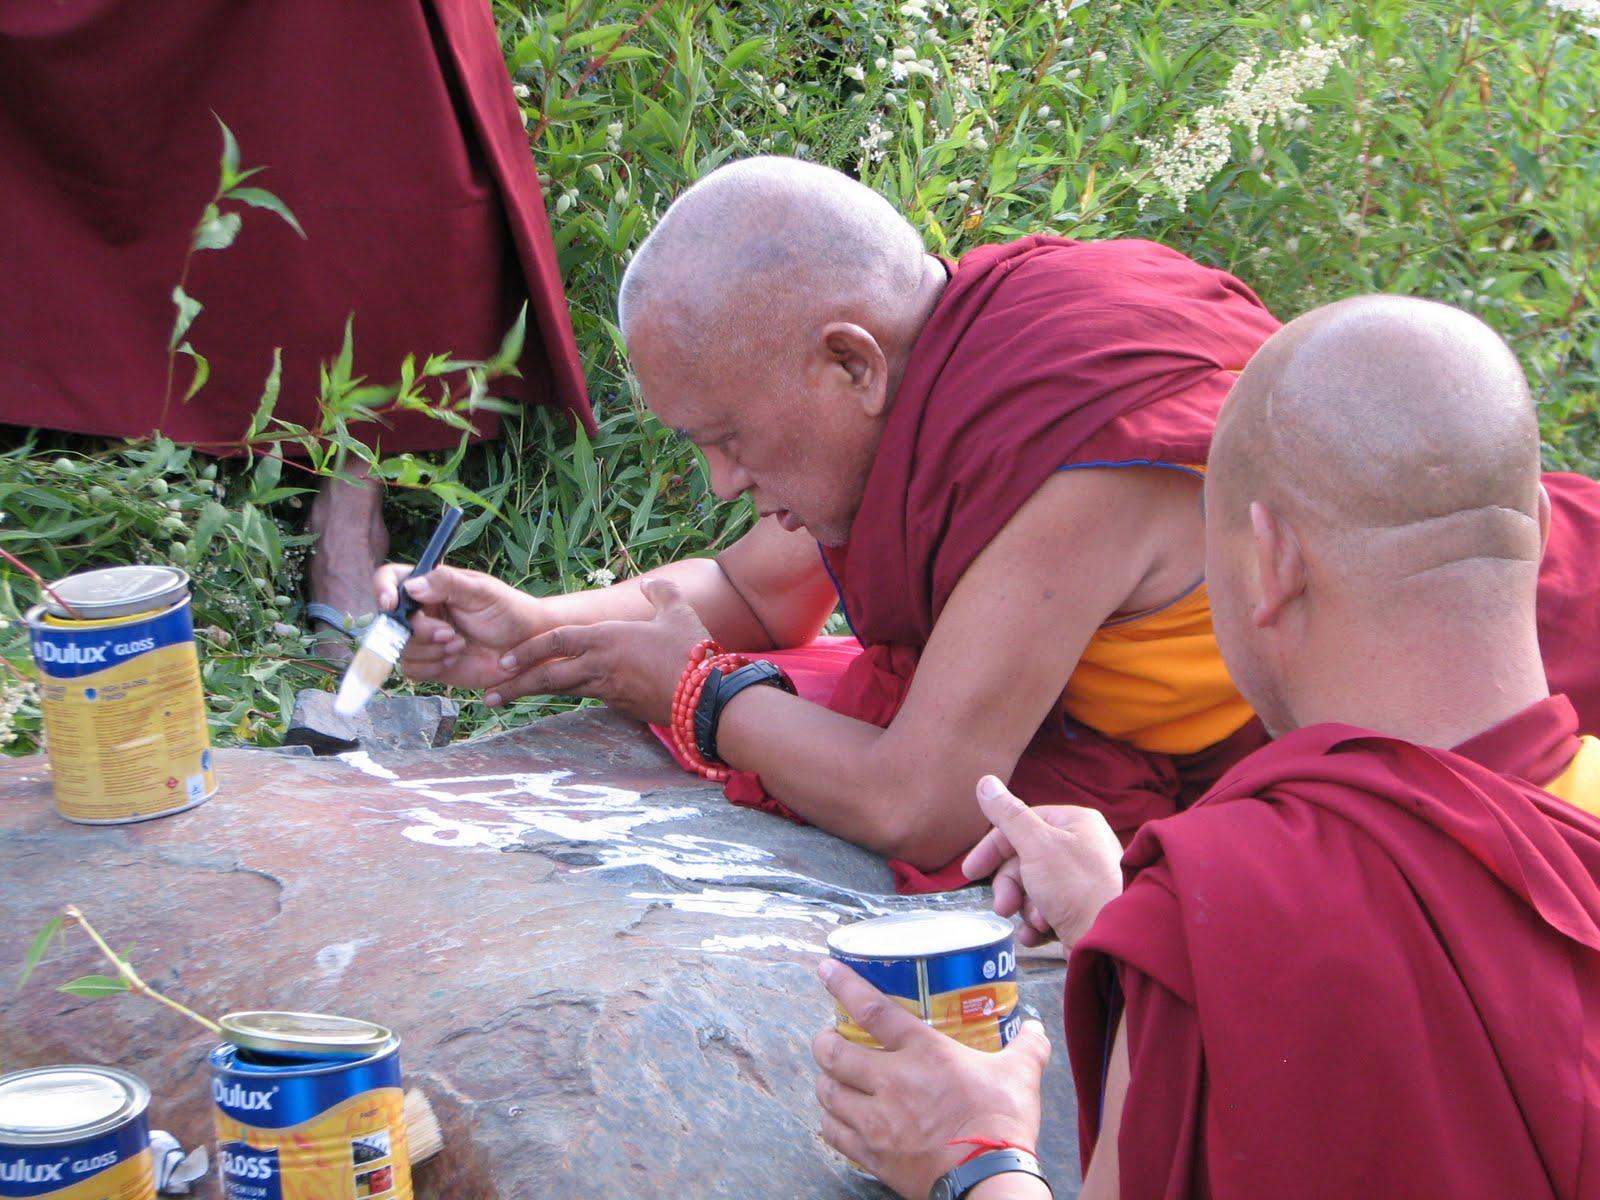 Rinpoche painting mantras on rock, Manali, India, July 24, 2013. Photo by Maya.